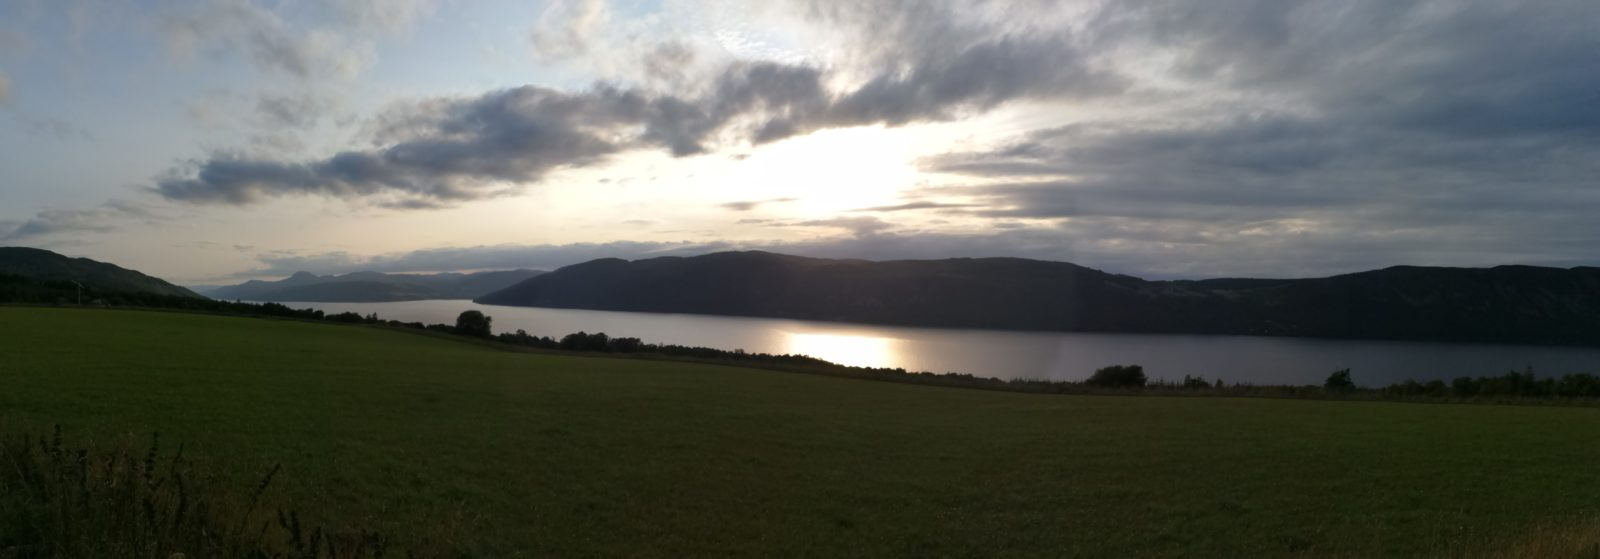 Le Loch Ness, Ecosse